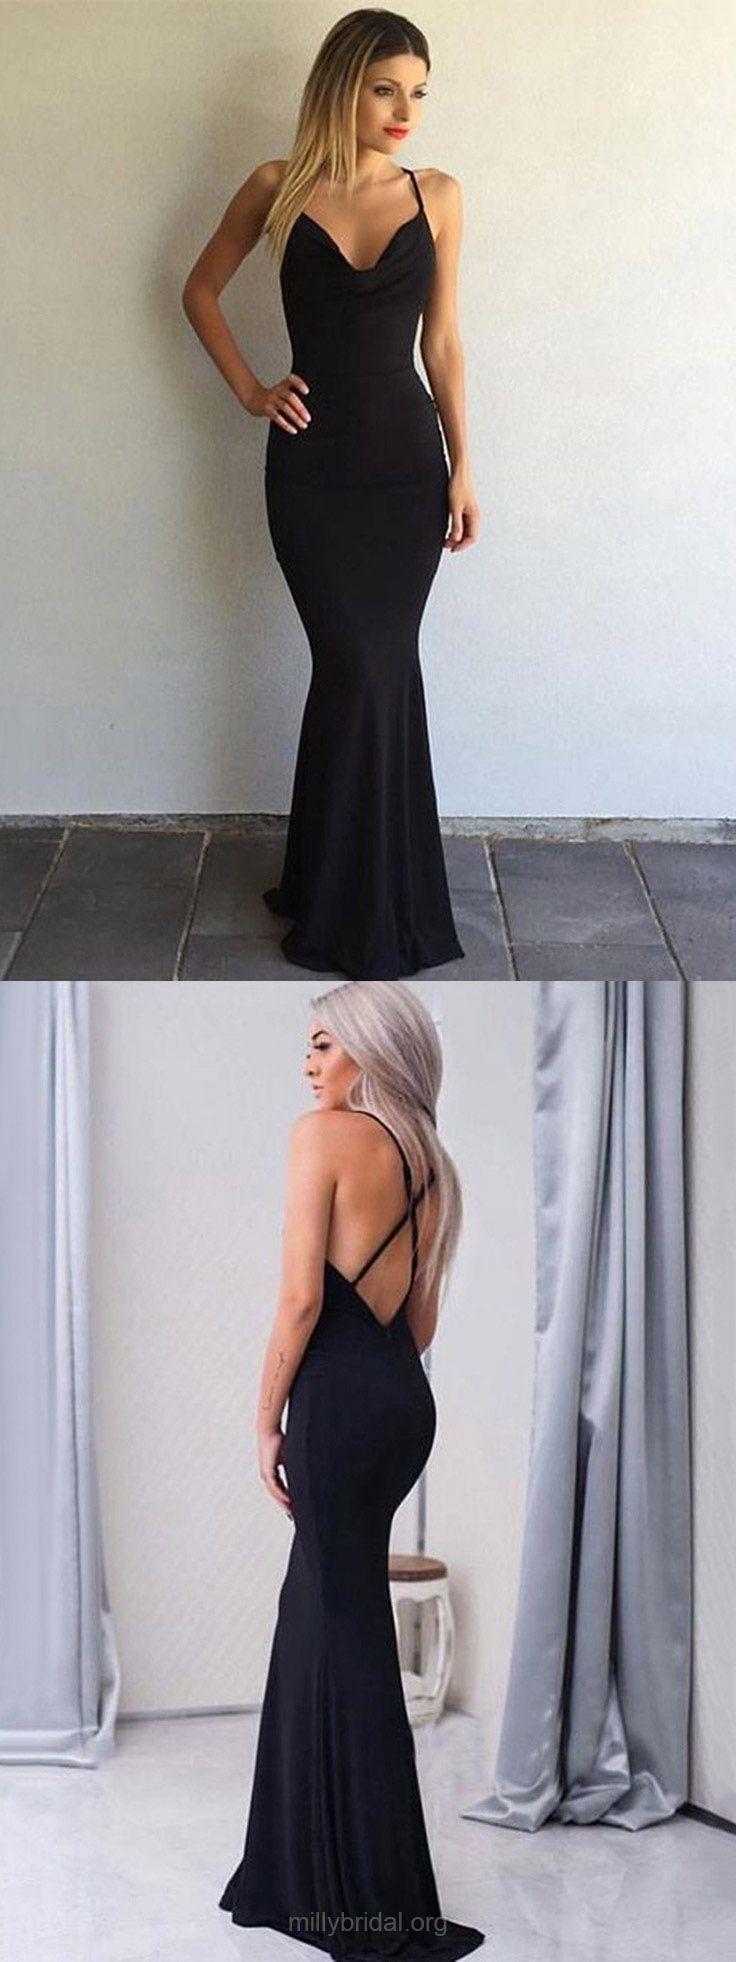 Prom dresses black prom dresses long prom dresses girls prom